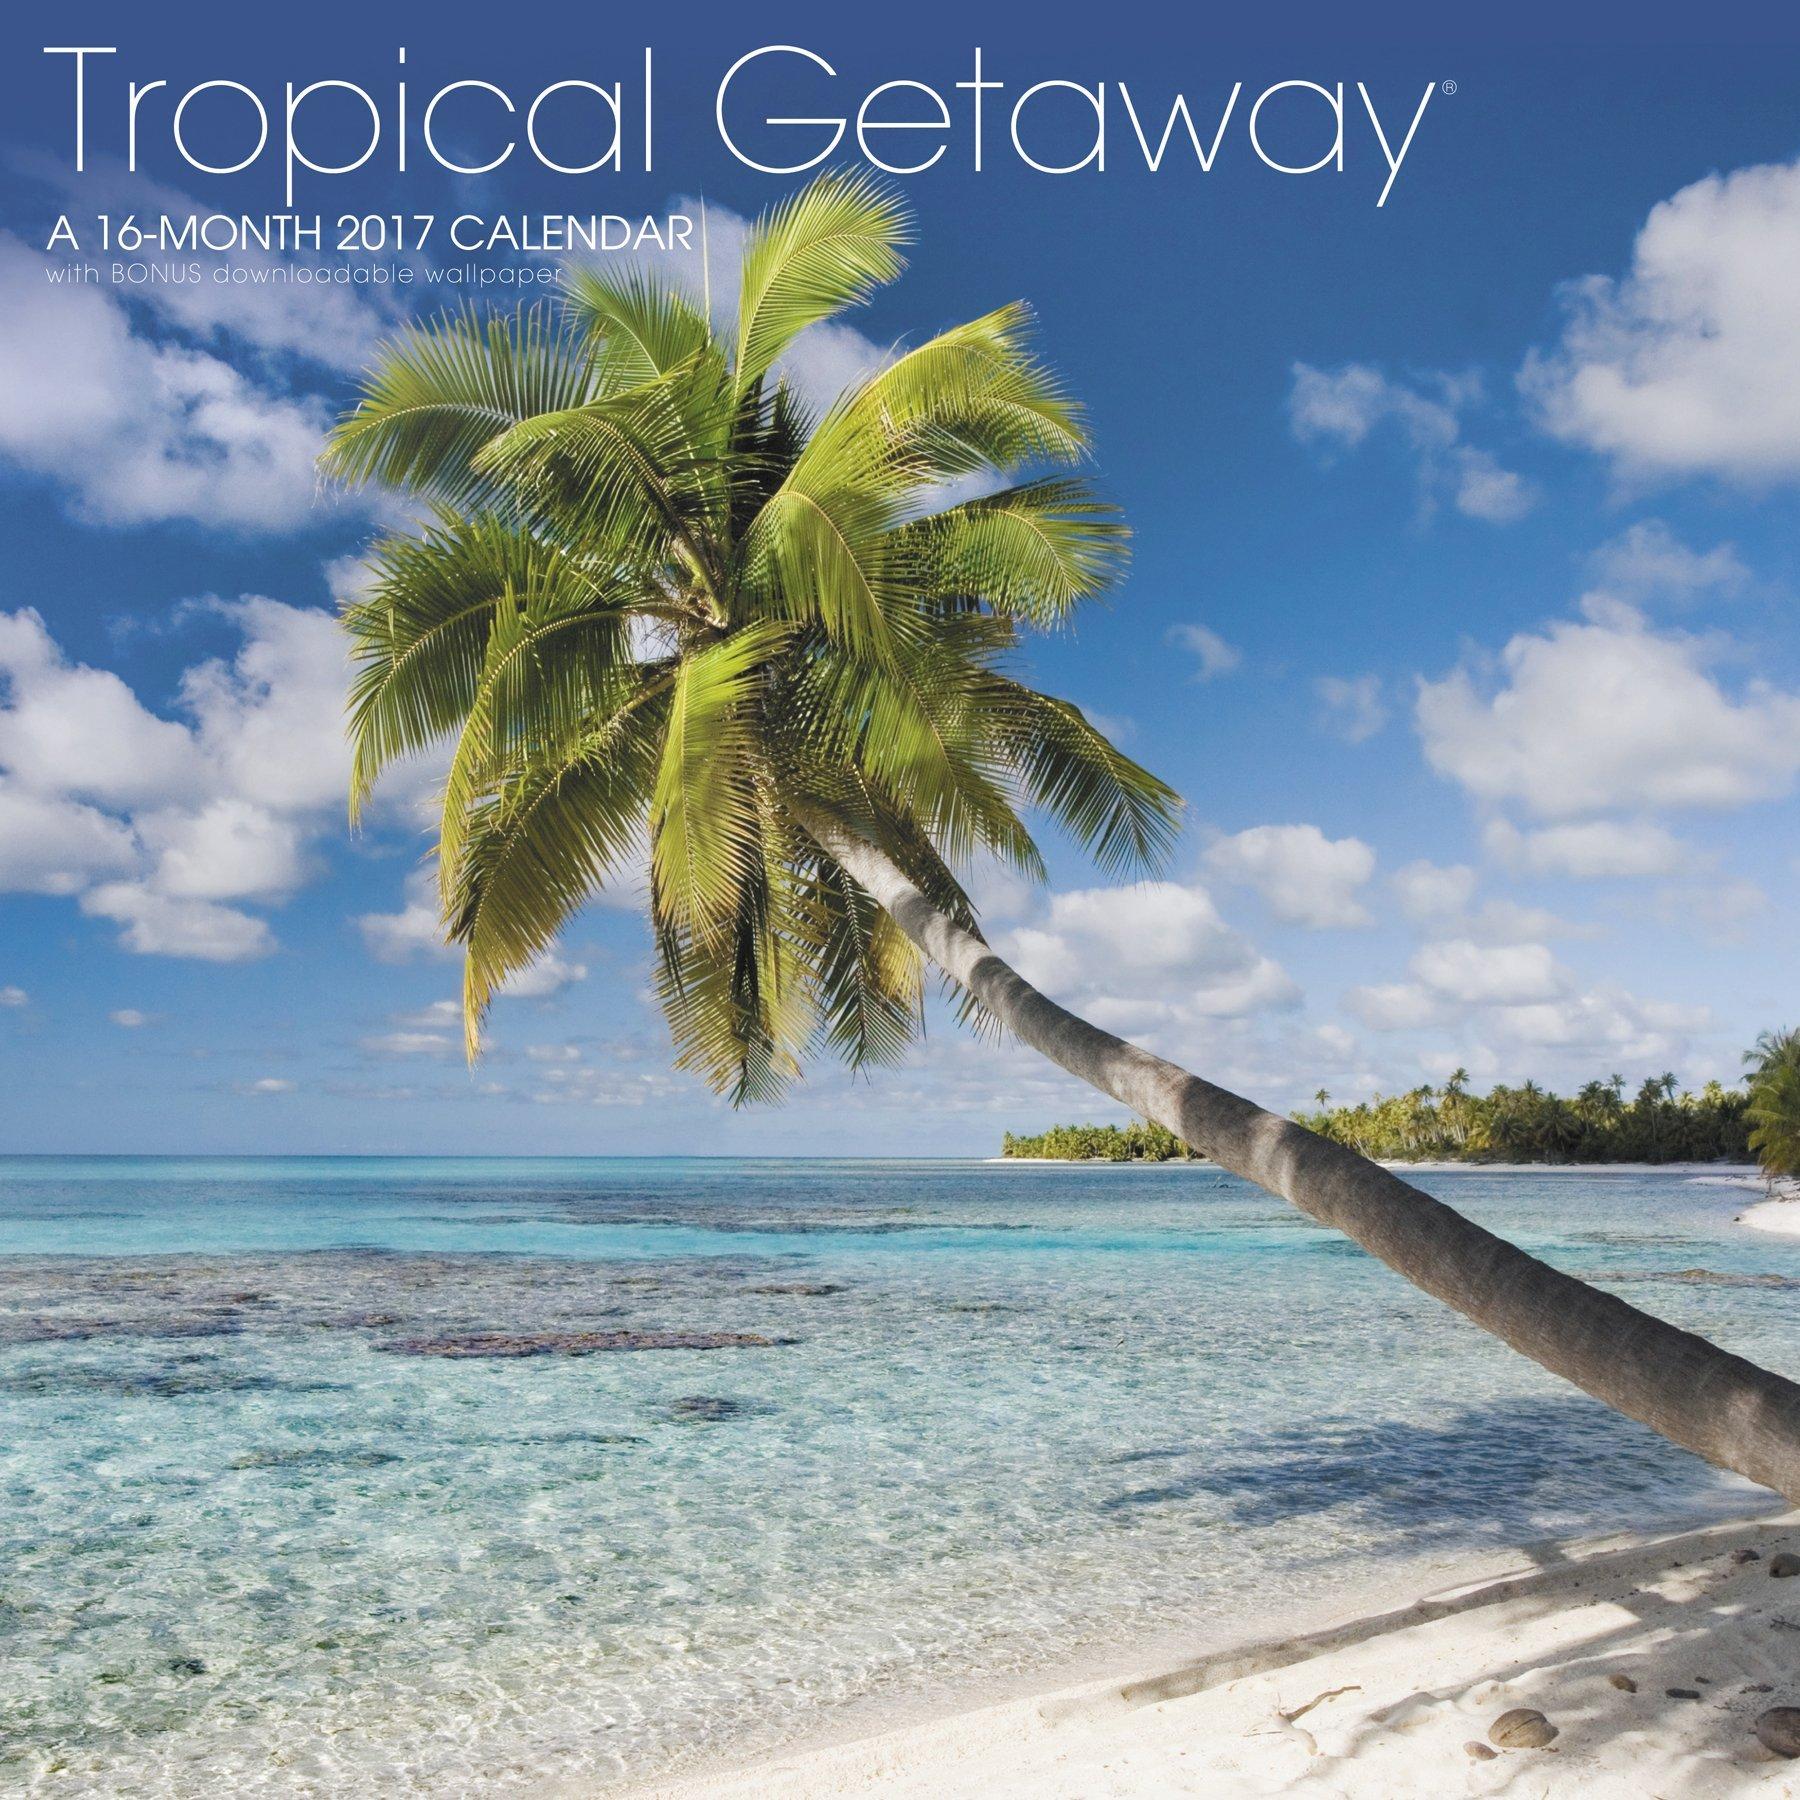 Tropical Getaway Wall Calendar Landmark product image